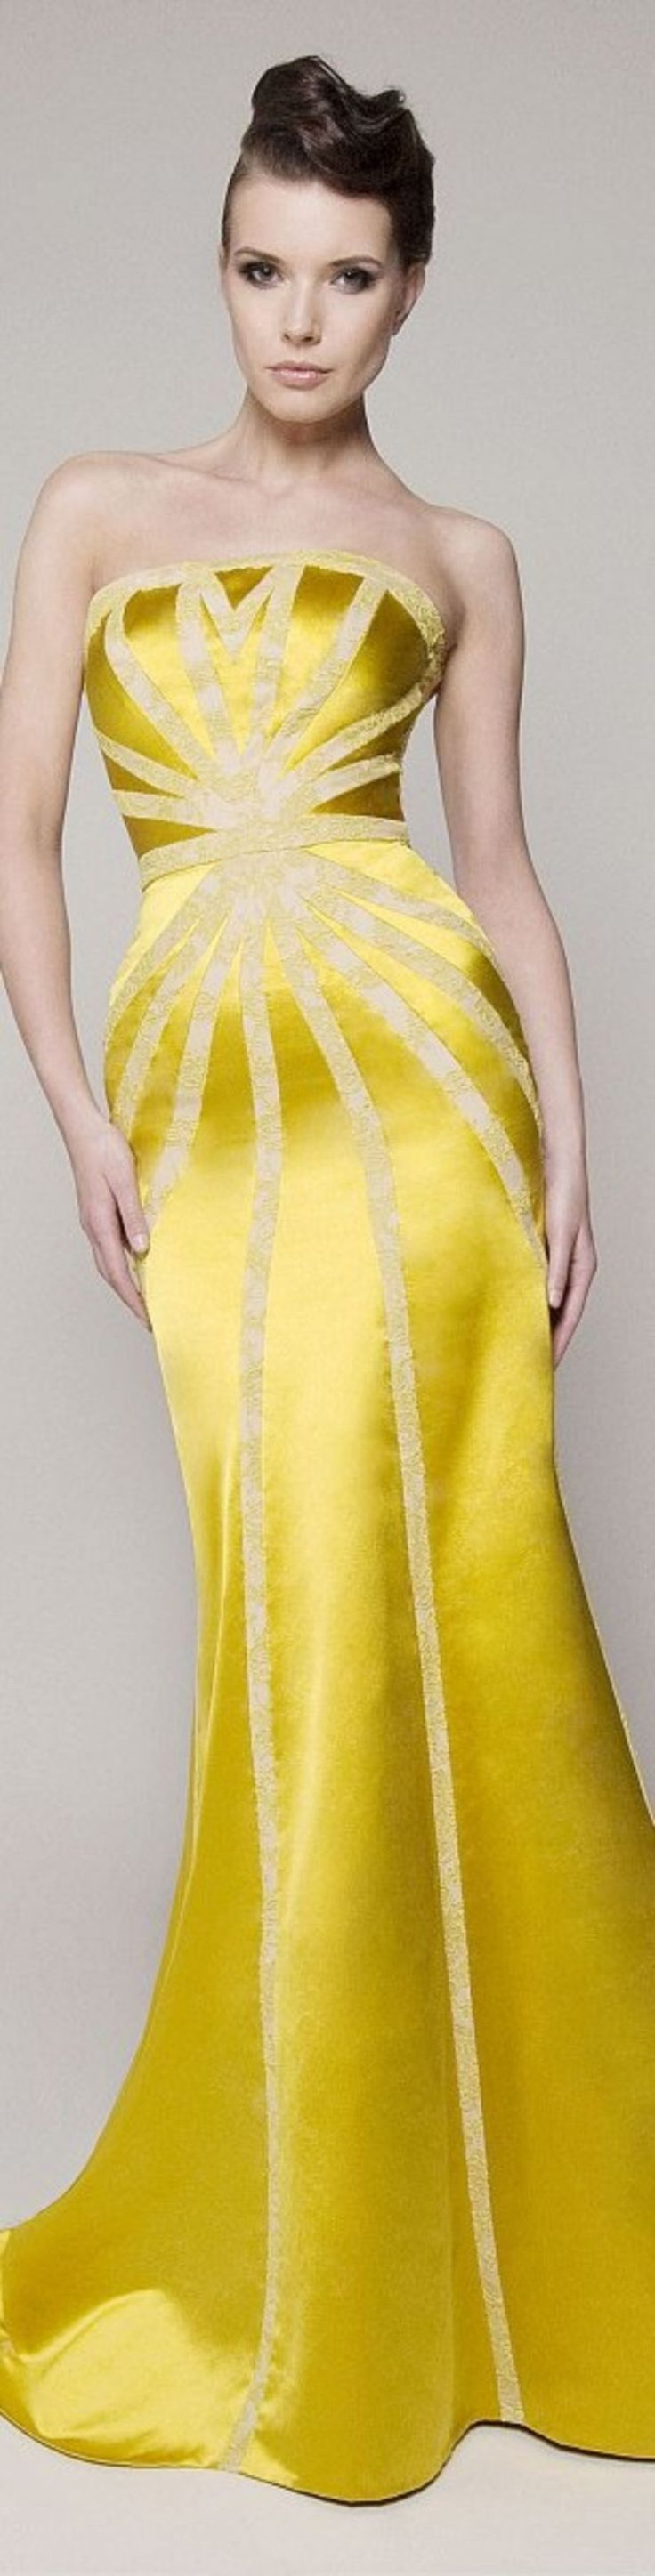 60 Inspiring Yellow Lace Wedding Dress Ideas